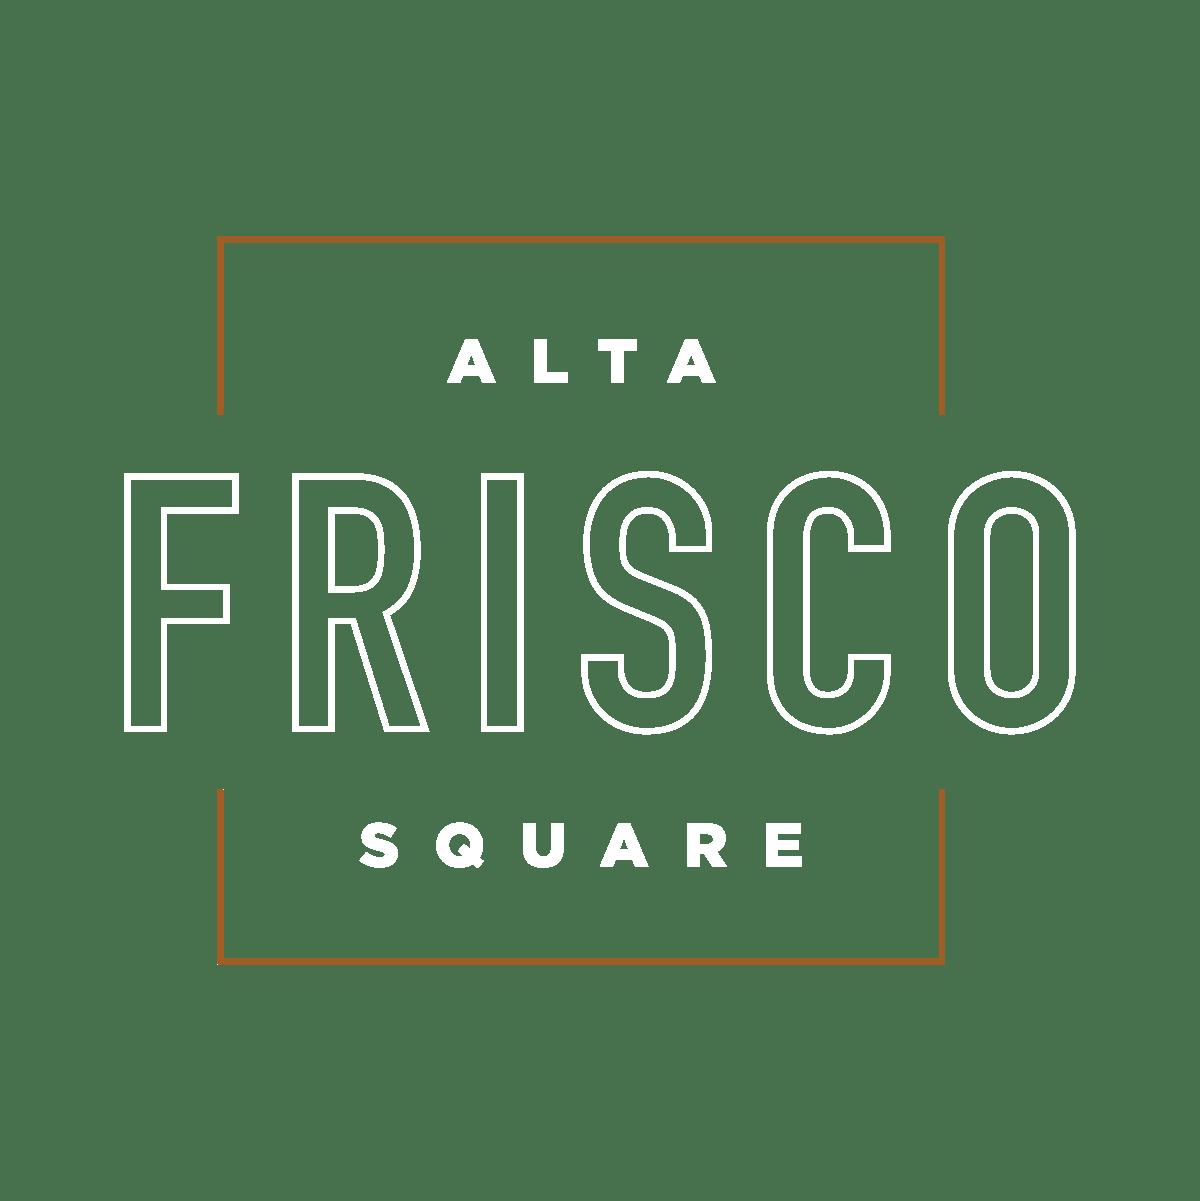 Alta Frisco Square